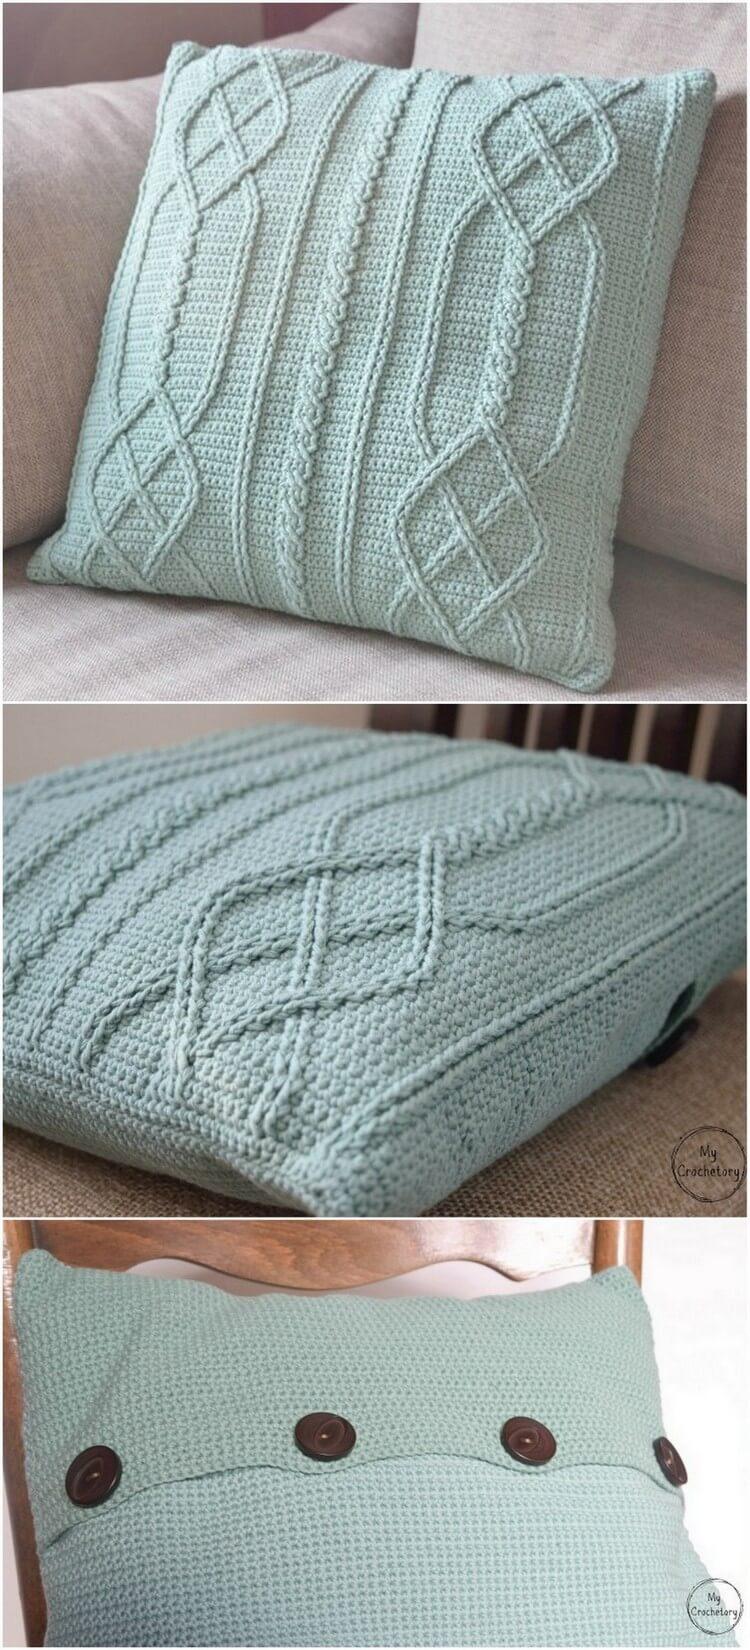 Crochet Pillow Free Pattern (14)